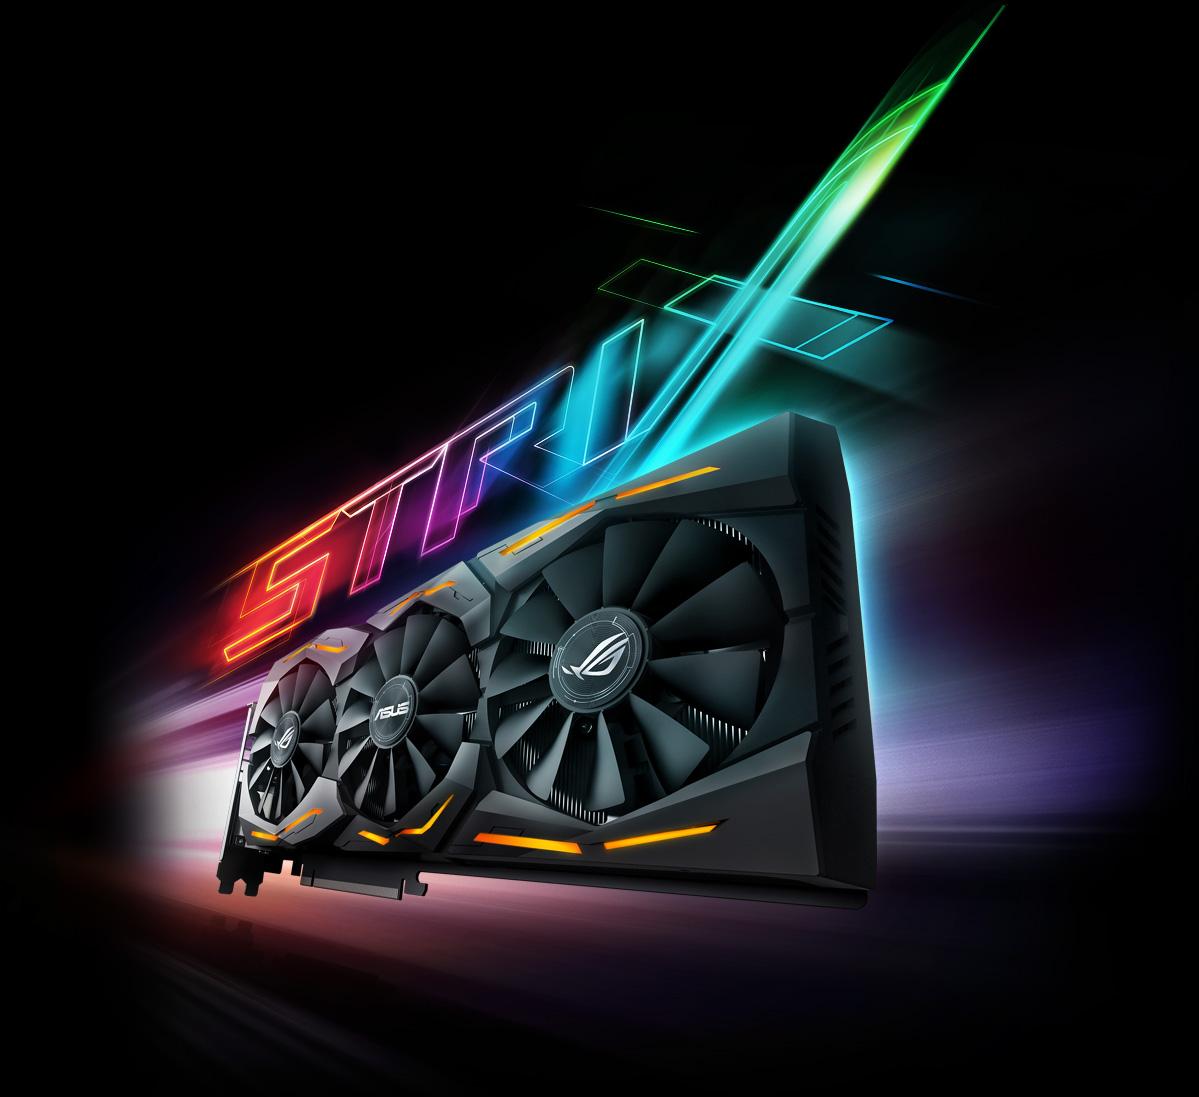 Asus Strix Gaming Geforce GTX-1060 OC 6GB